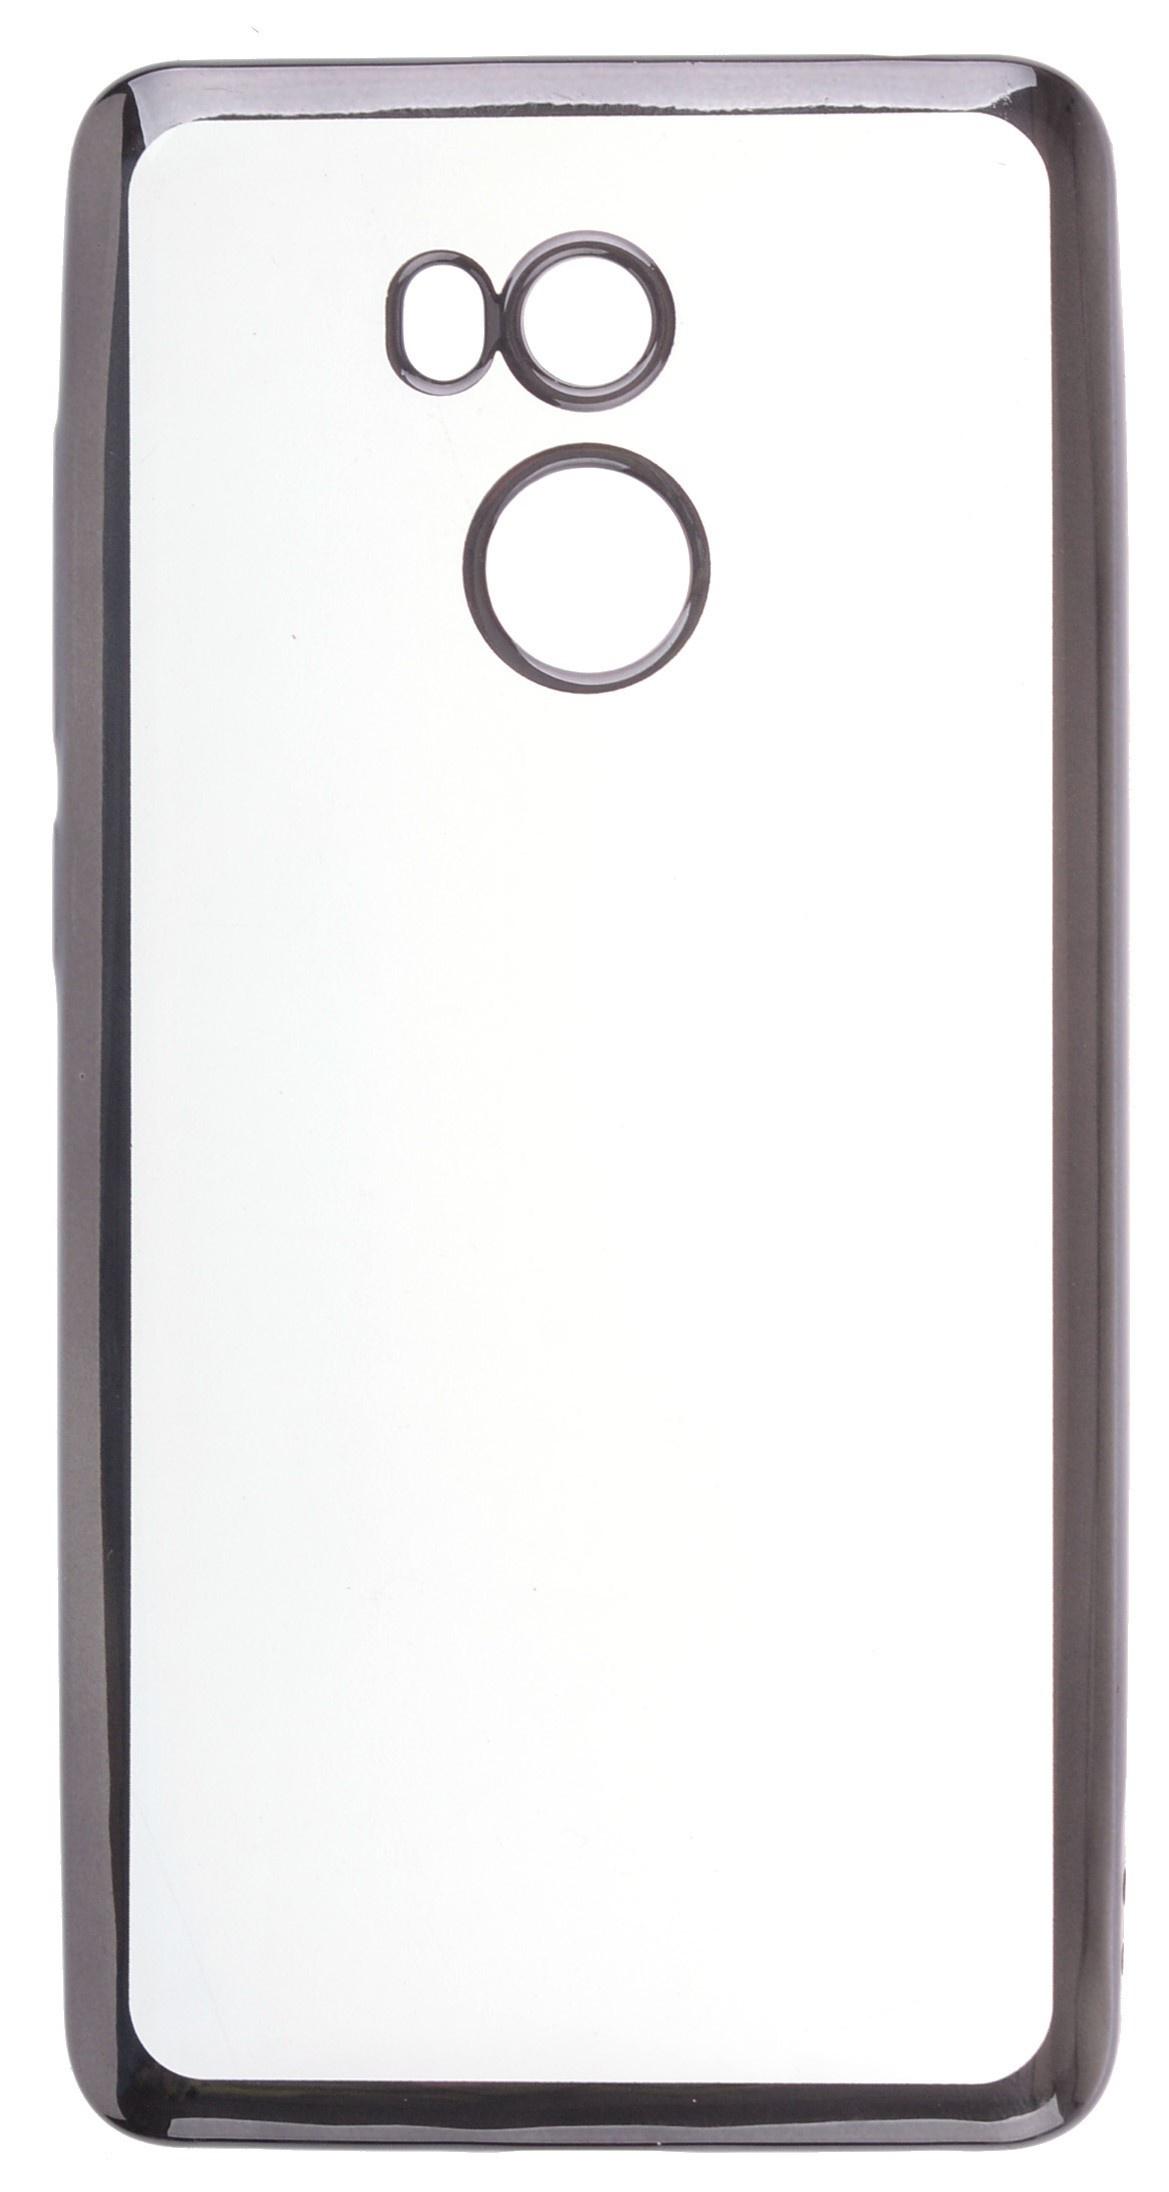 Чехол для сотового телефона skinBOX Silicone chrome border, 4630042529588 цена и фото